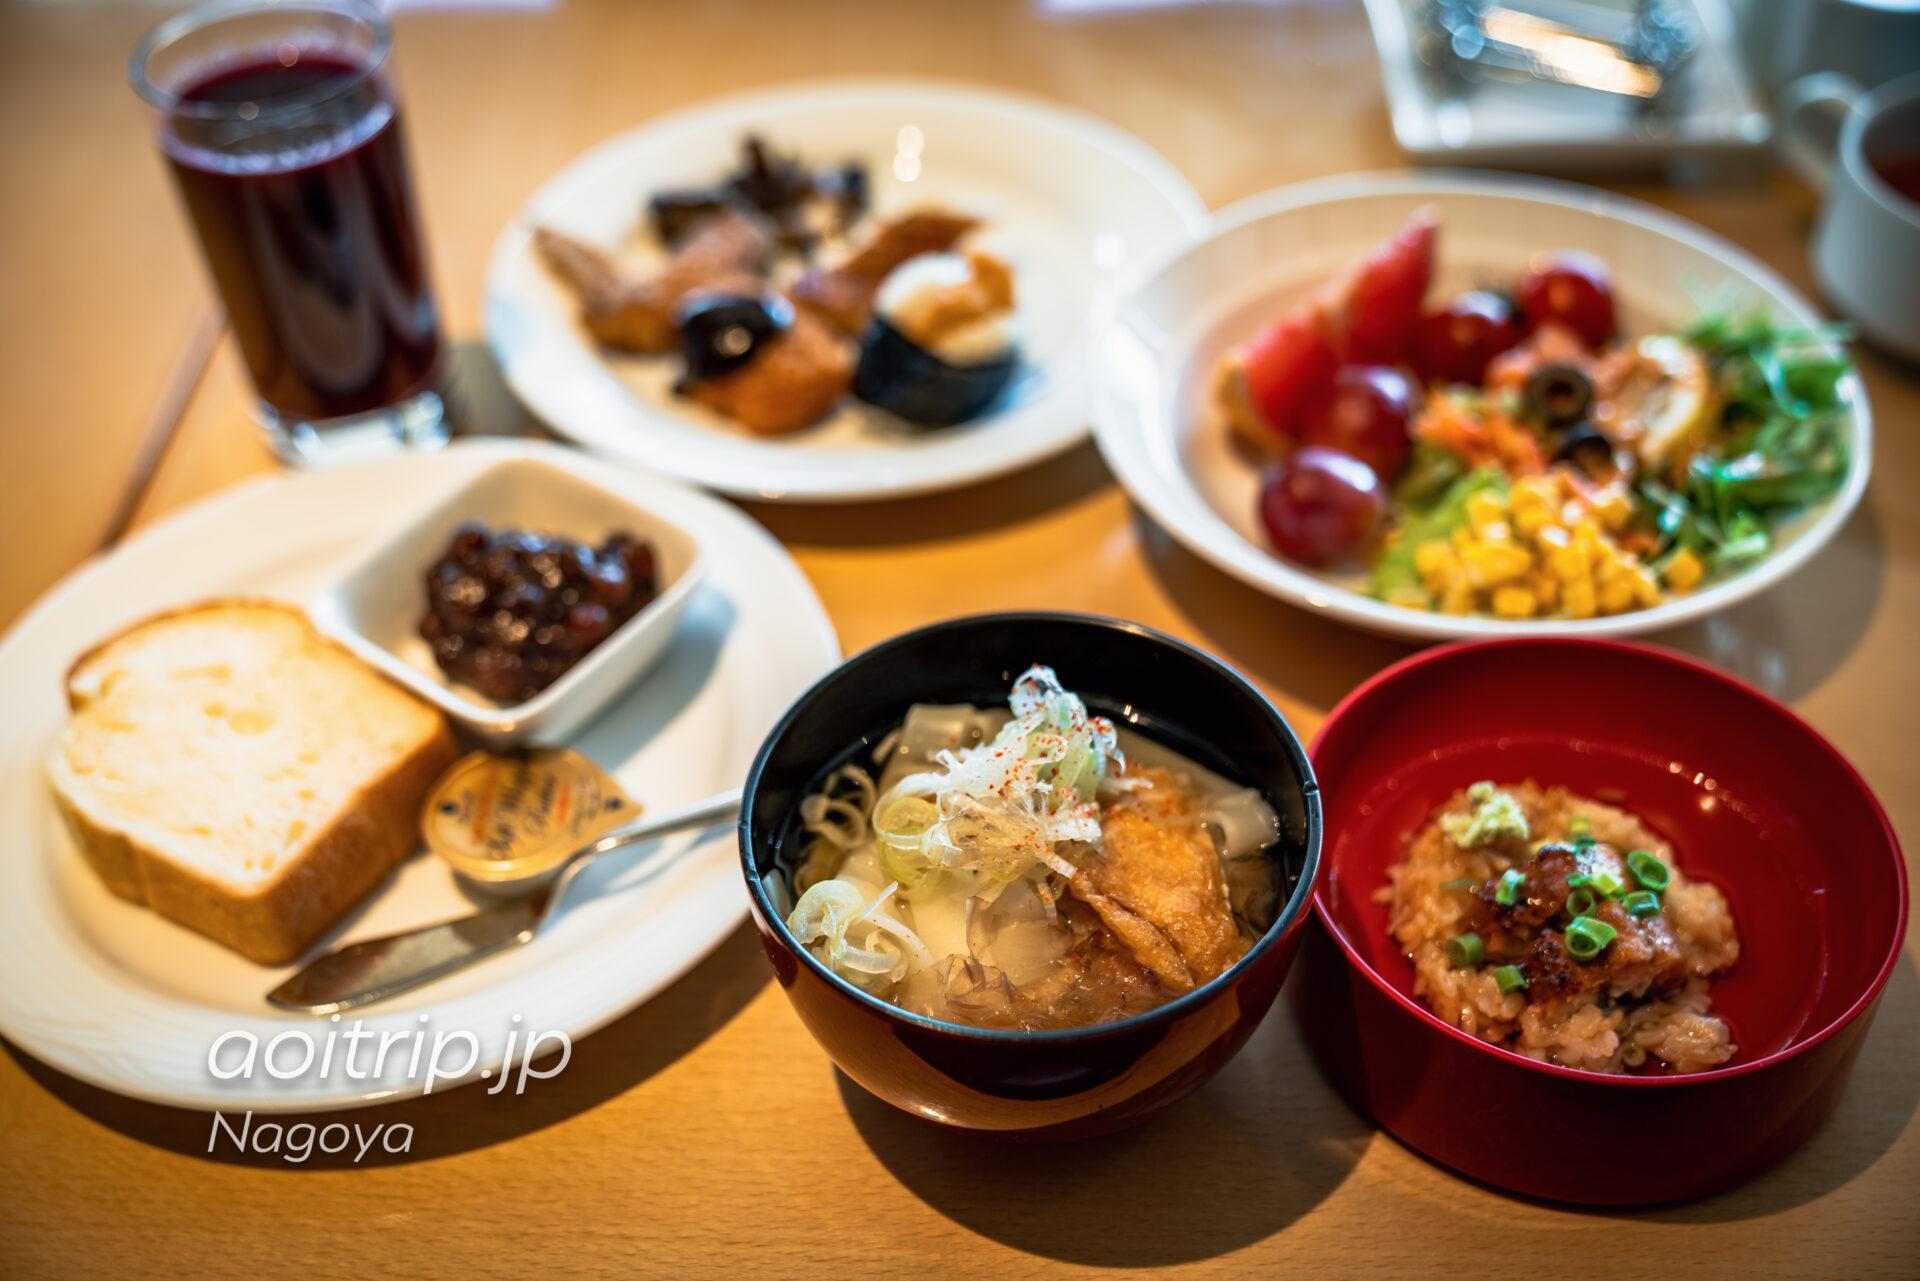 ANAクラウンプラザホテルグランコート名古屋 宿泊記|ANA Crowne Plaza Hotel Grand Court Nagoya 朝食